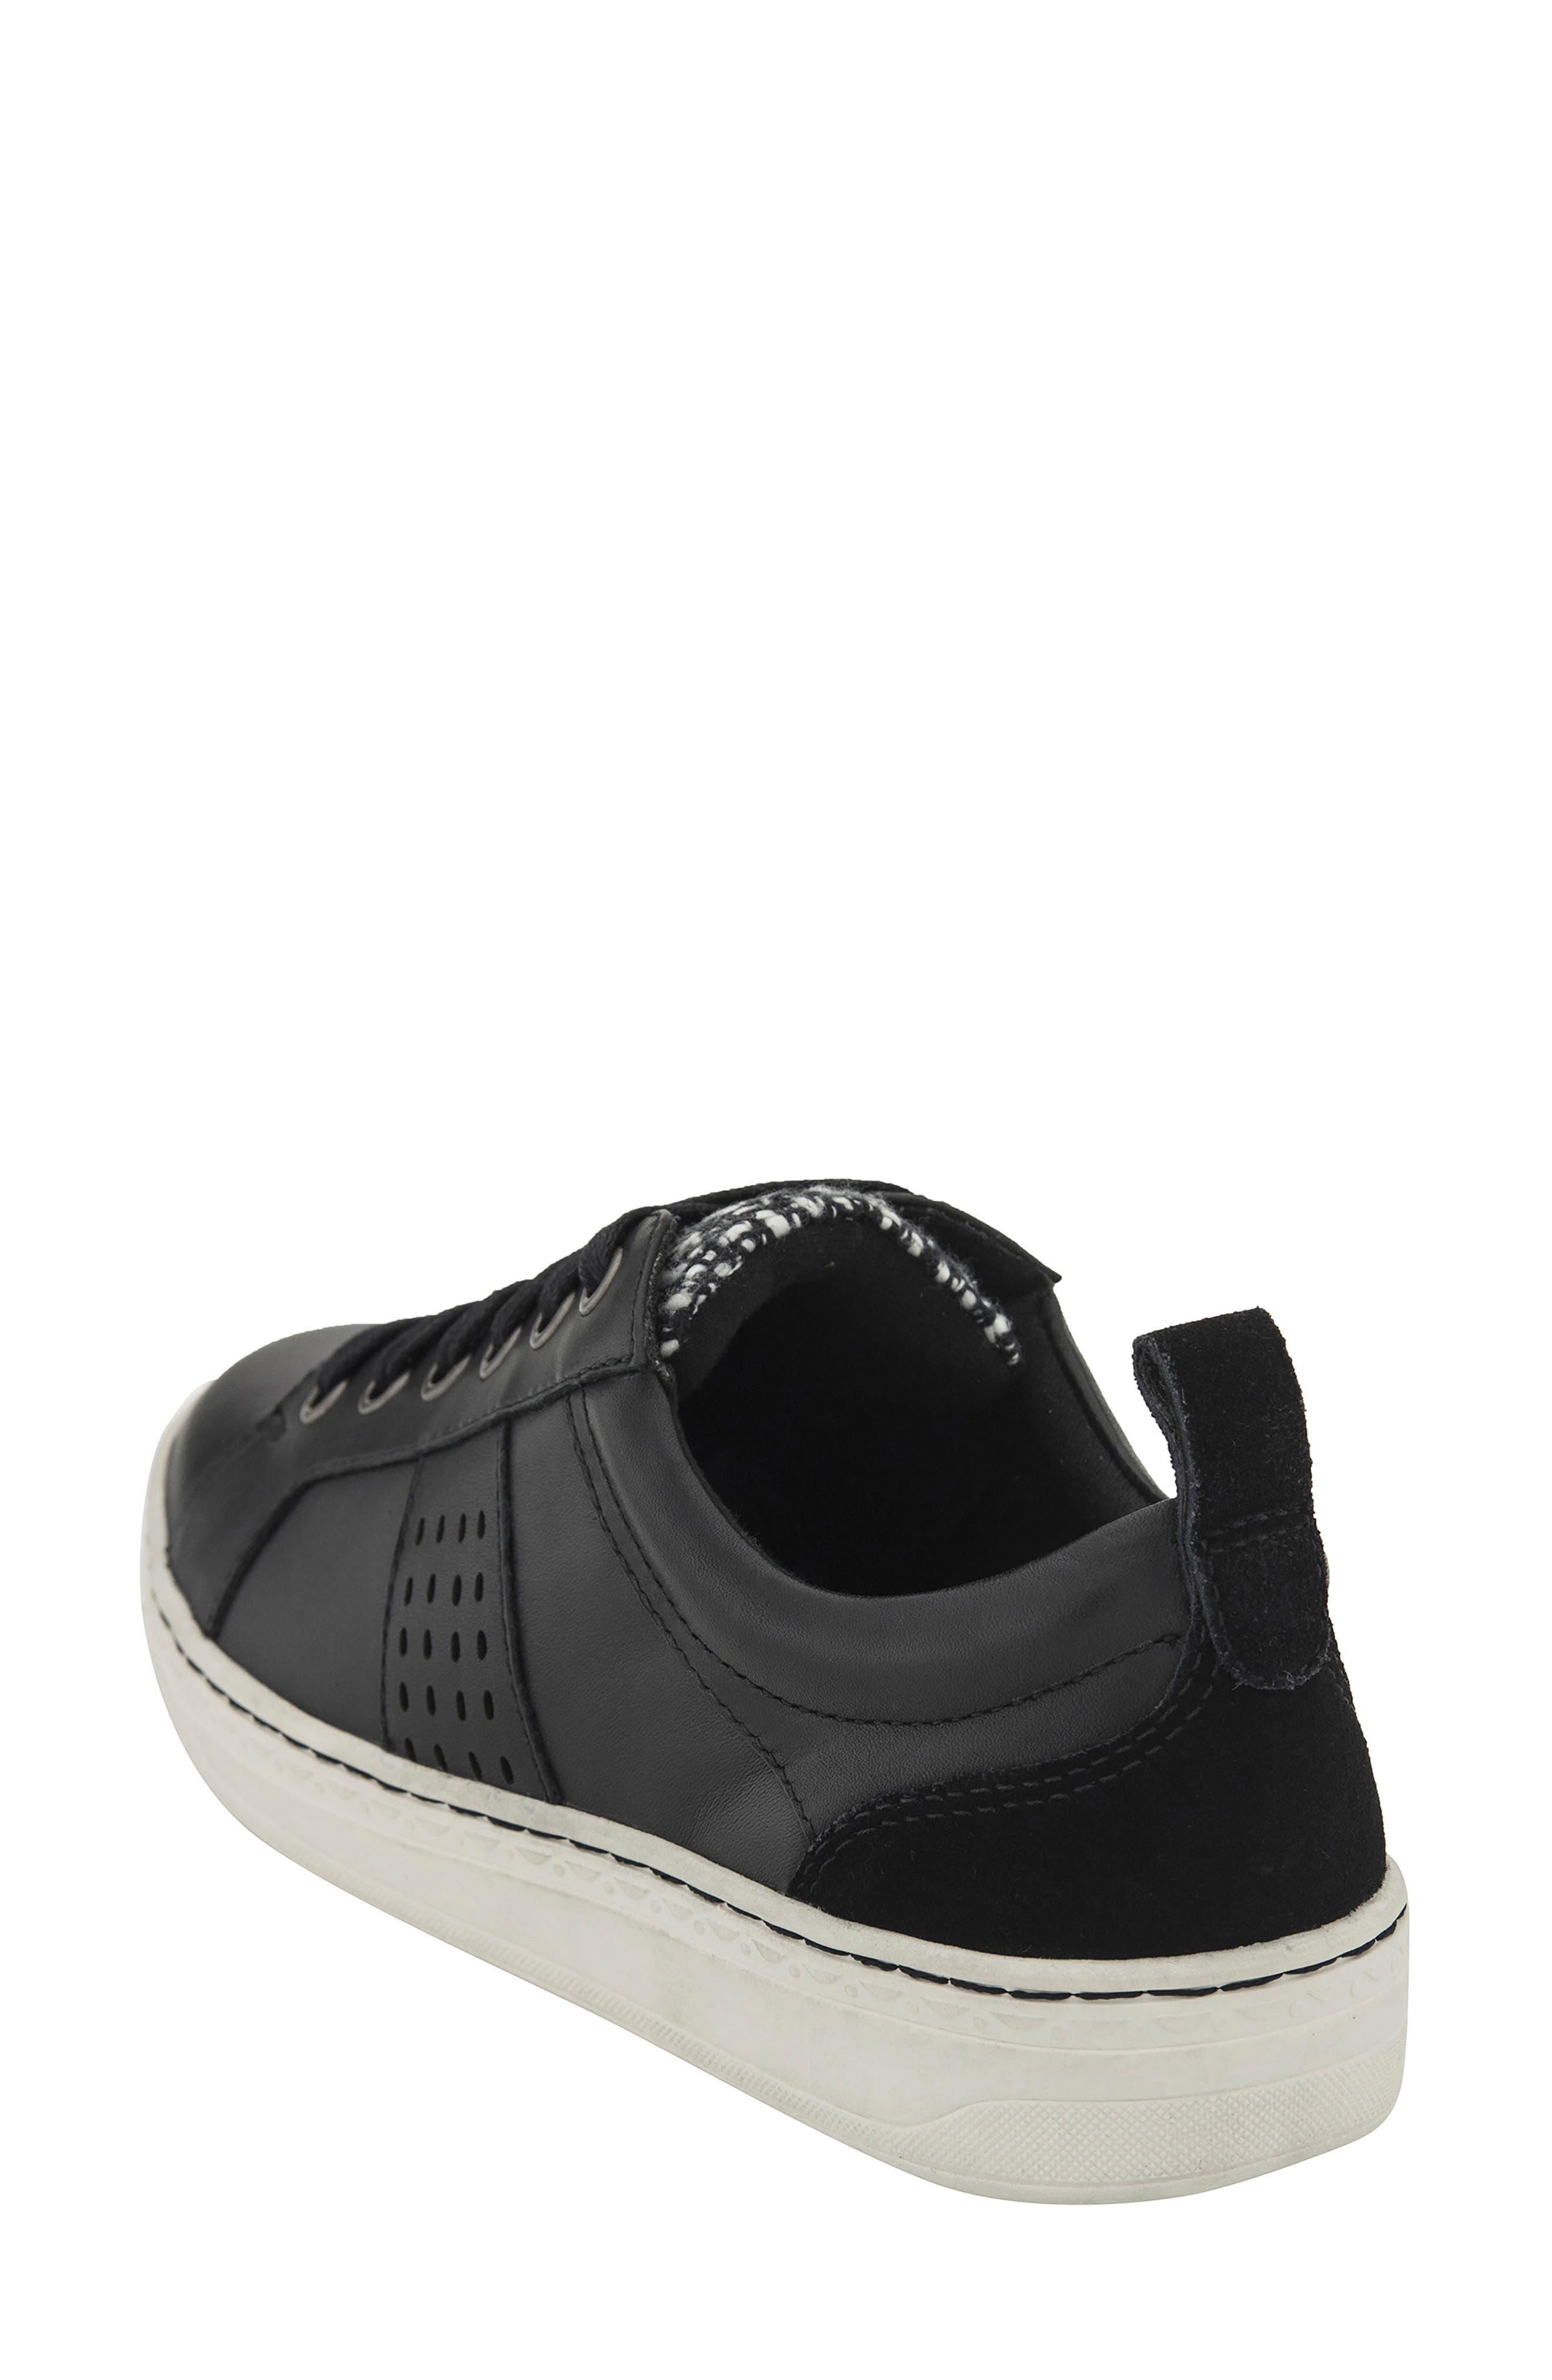 Zag Sneaker,                             Alternate thumbnail 11, color,